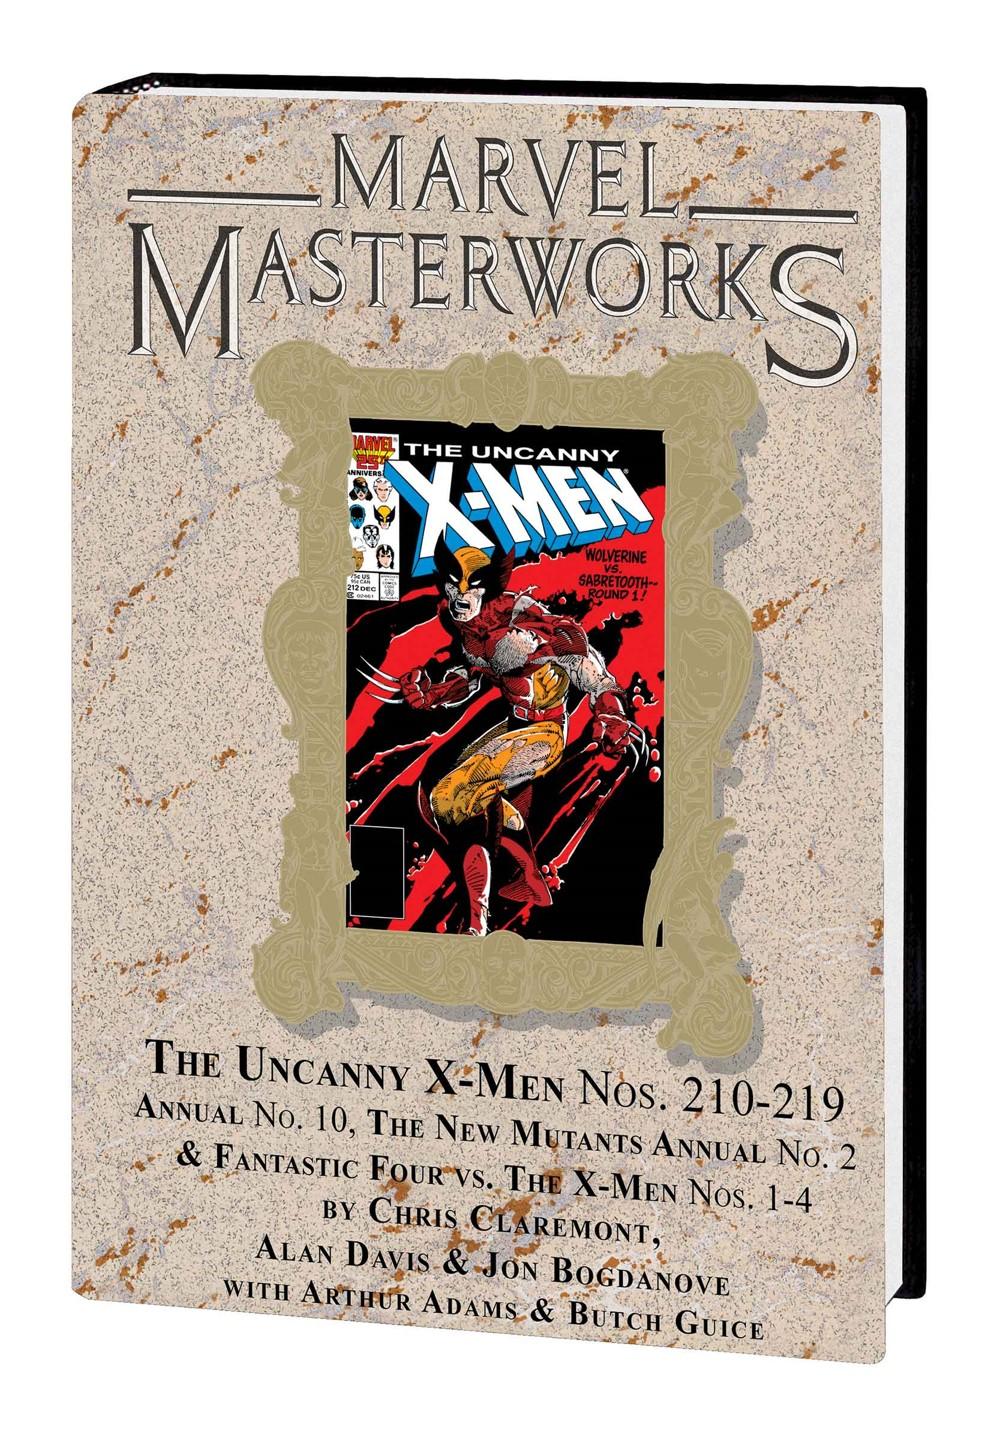 MMUNCX014HCvar_solicit Marvel Comics October 2021 Solicitations